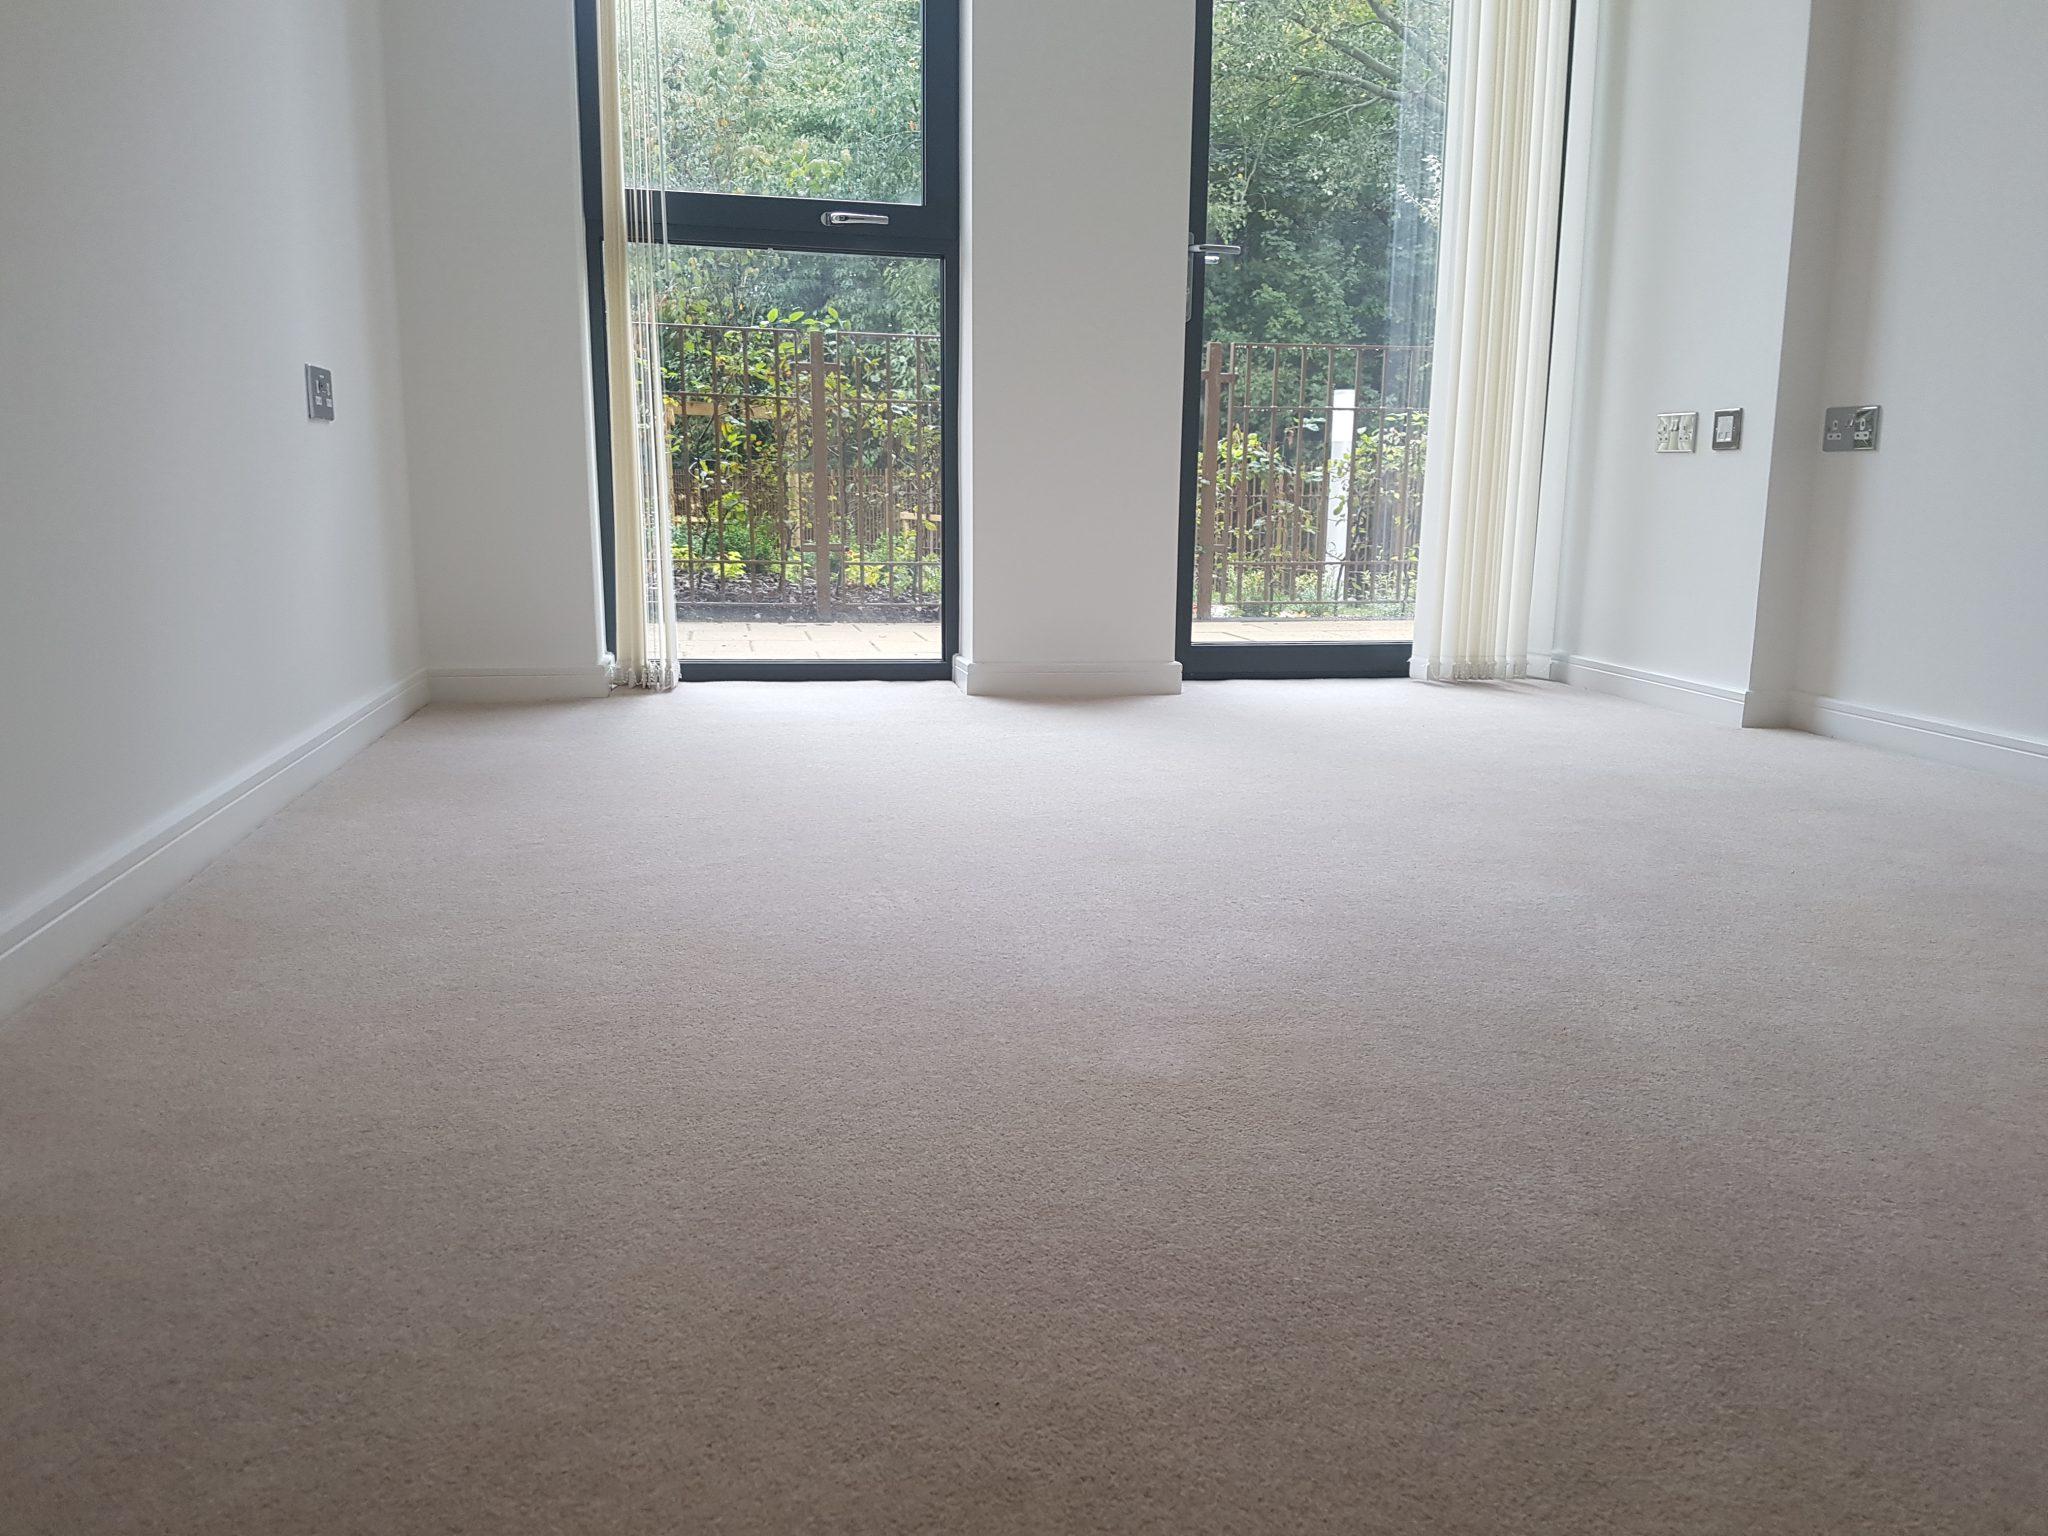 Carpet Cleaning In Thornton Heath Cr7 Postcode Area